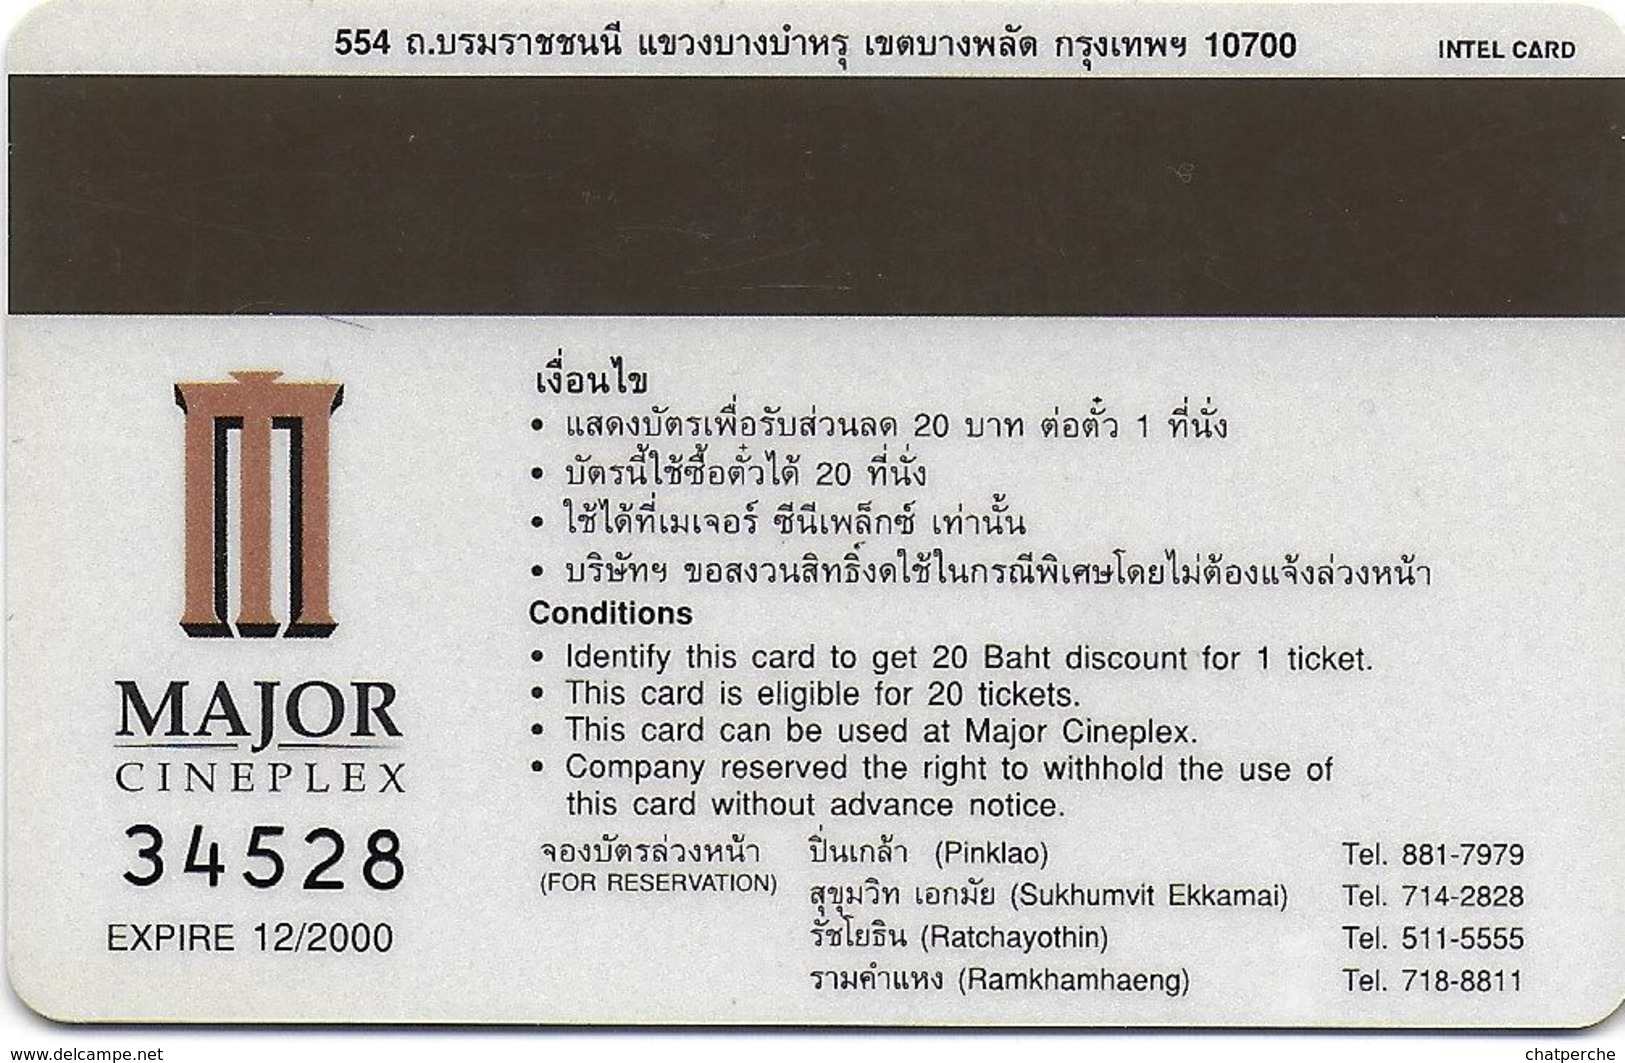 THAÏLANDE CINECARTE PHONECARD CARTE BANDE MAGNETIQUE TOY 2 STORY 12/2000  MAJOR CINEPLEX - Thaïlande